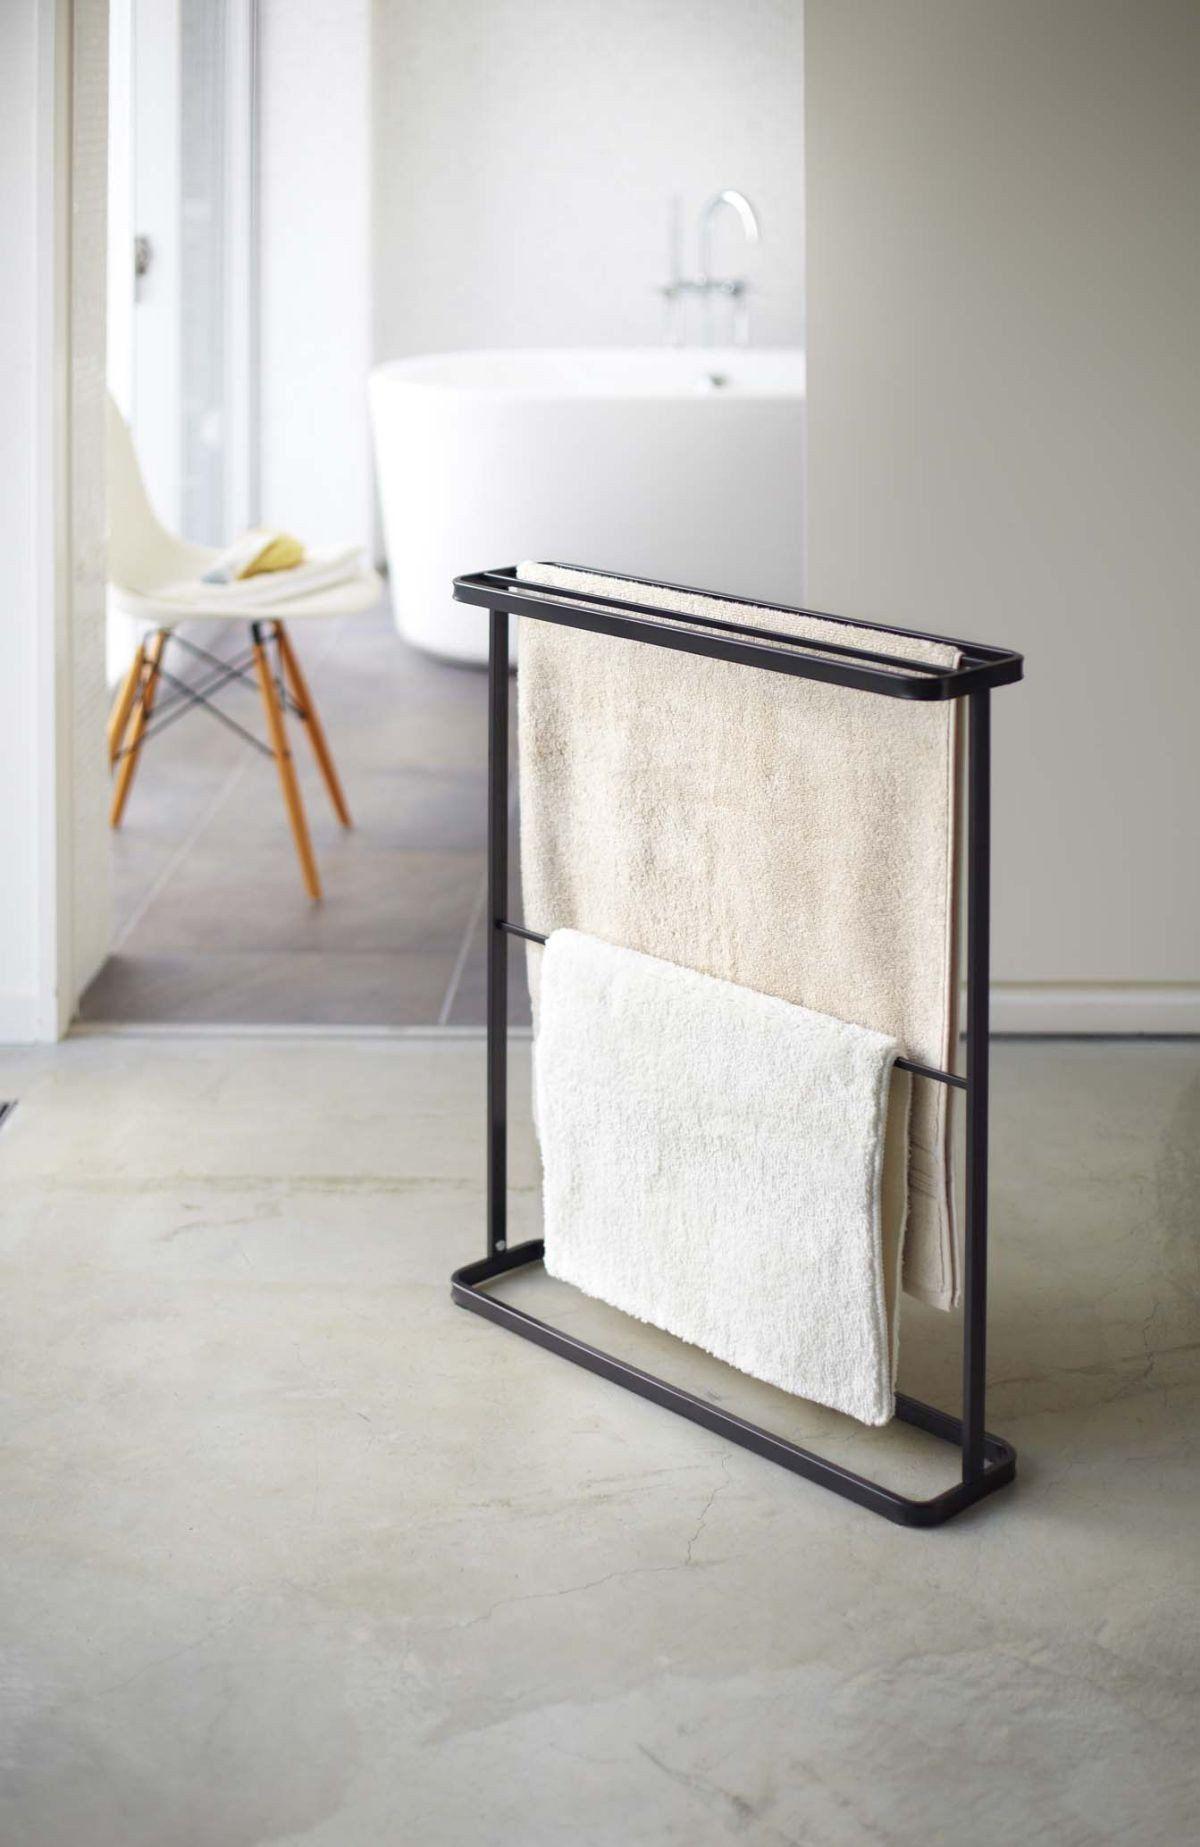 Tower Bath Towel Hanger in Various Colors design by Yamazaki ...